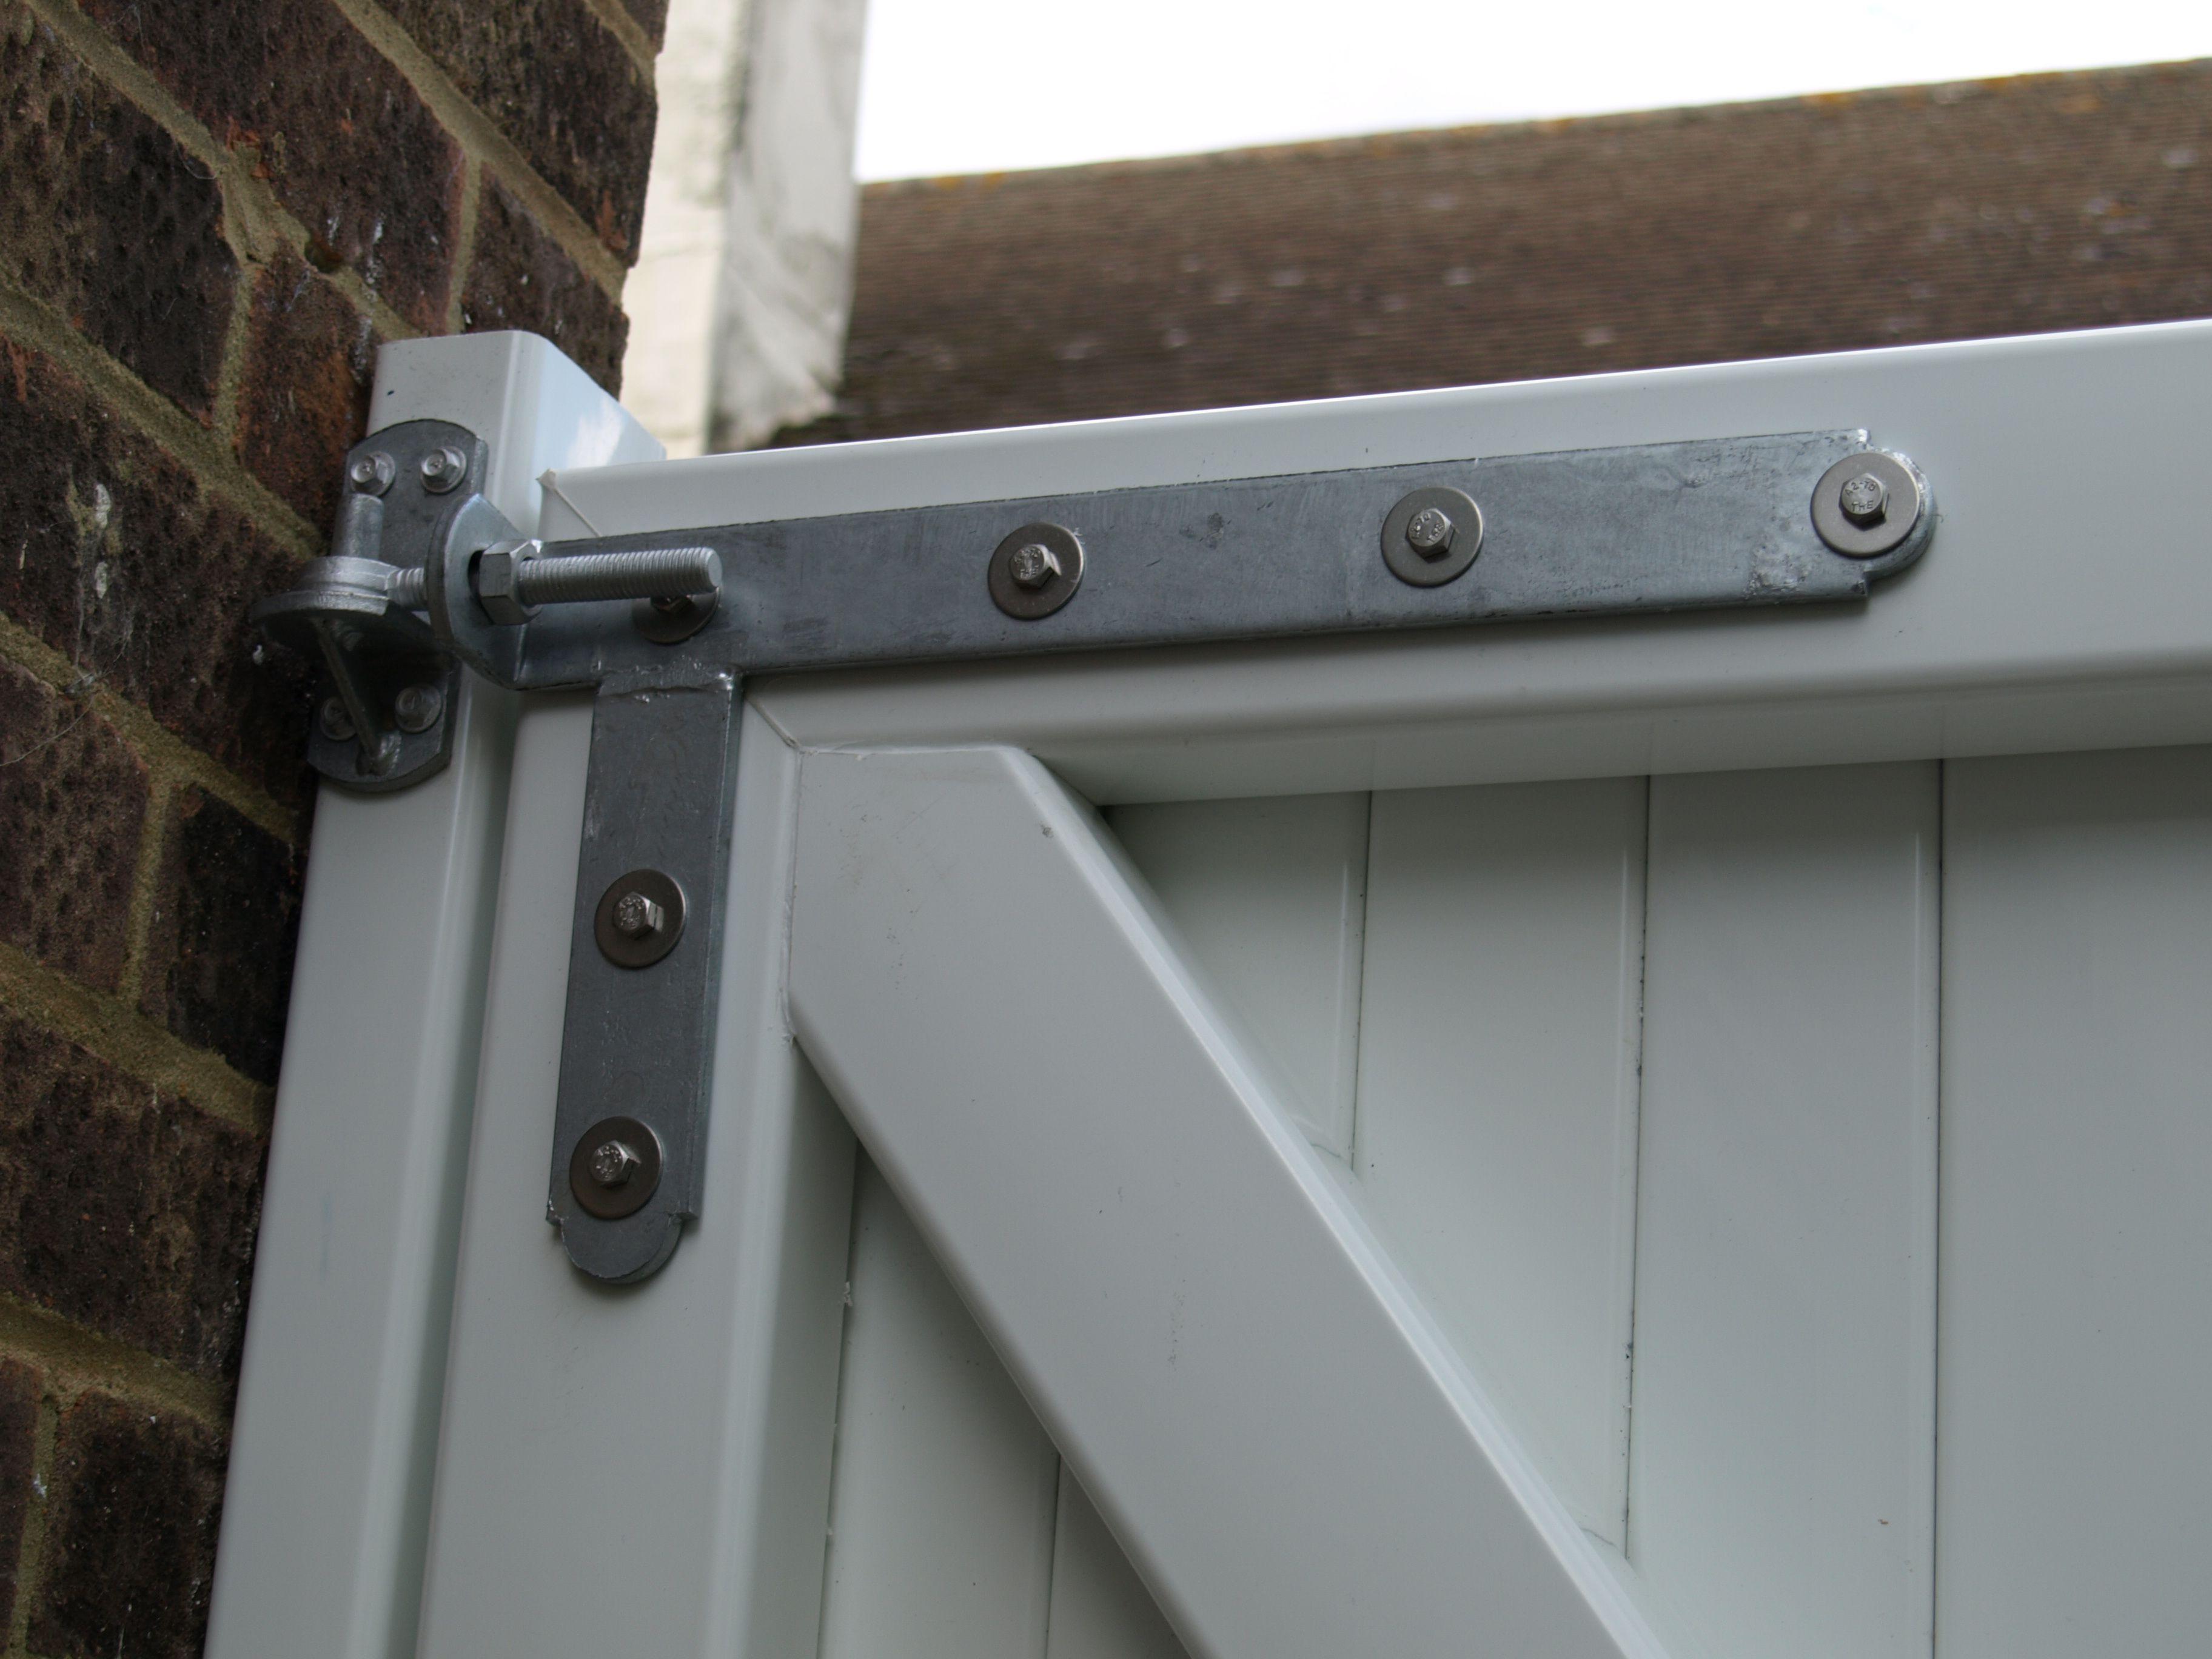 Adjustable Hinges Manufacturers Mail: Fensys UPVC Plastic Gate Braced Galvanised High